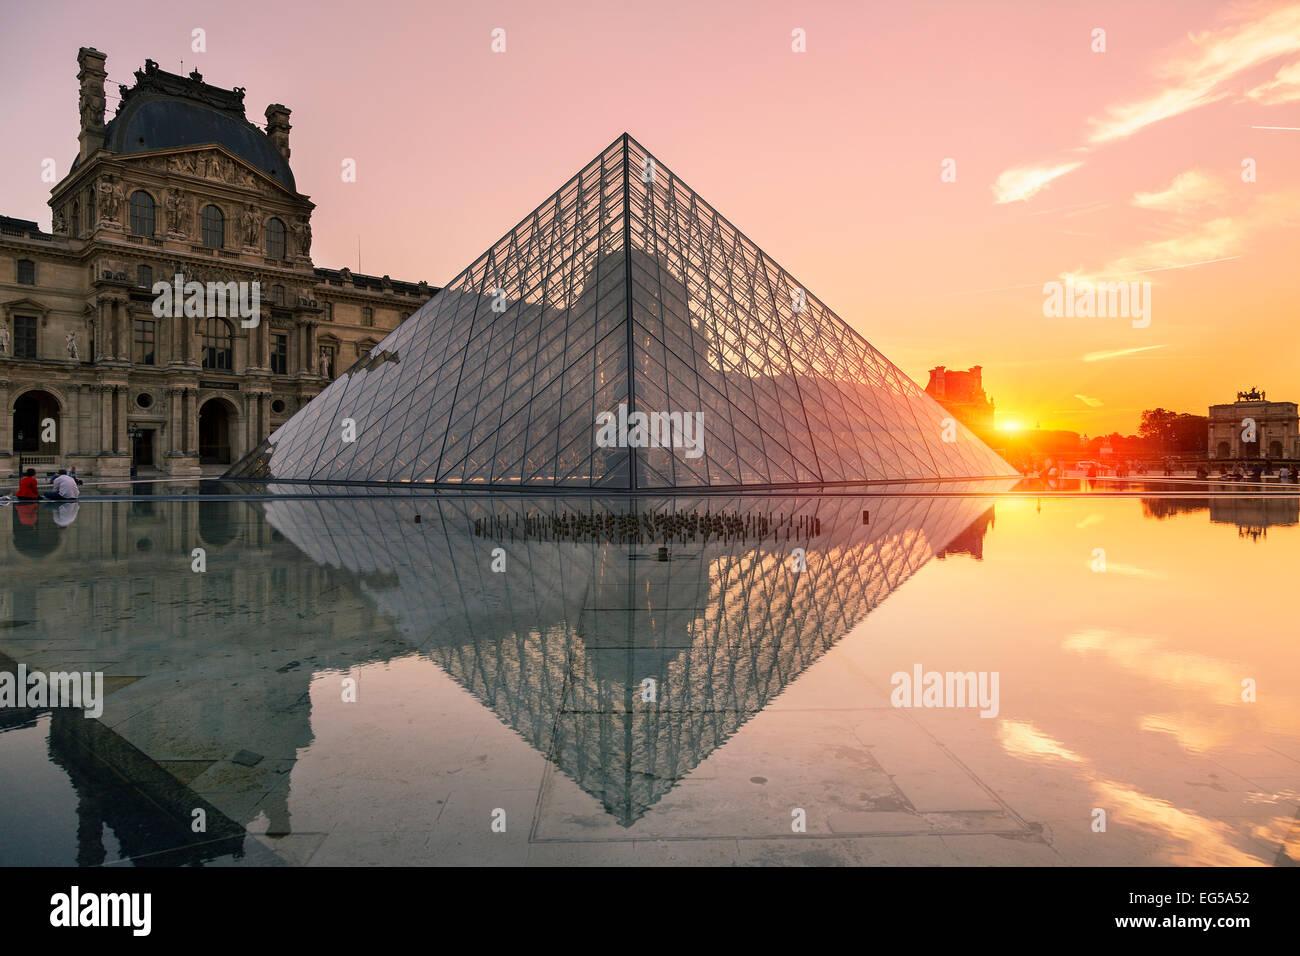 Paris, Louvre-Pyramide bei Sonnenuntergang Stockbild